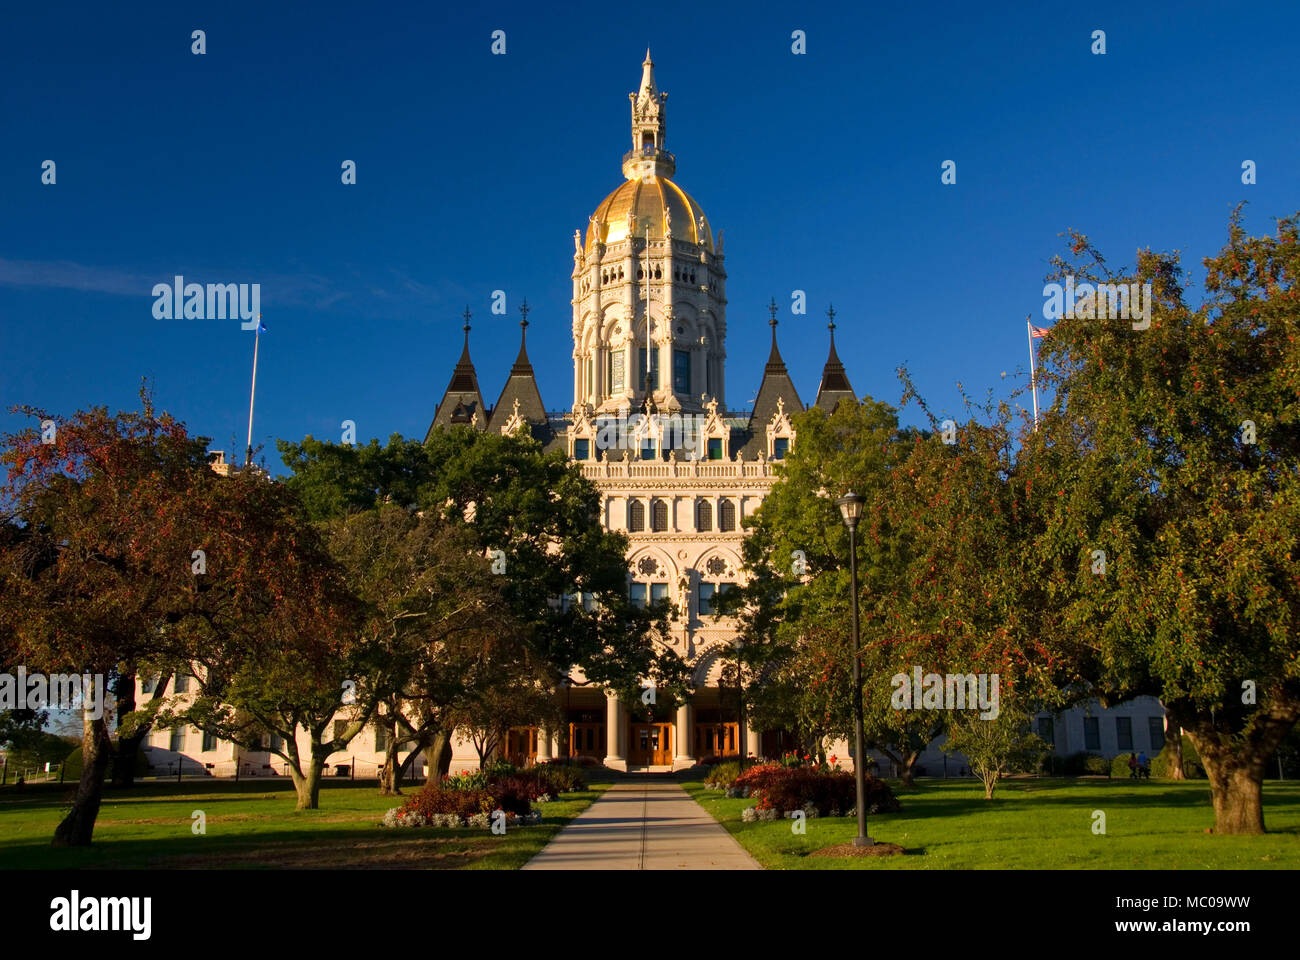 Connecticut State Capitol, Bushnell Park, Hartford, Connecticut - Stock Image